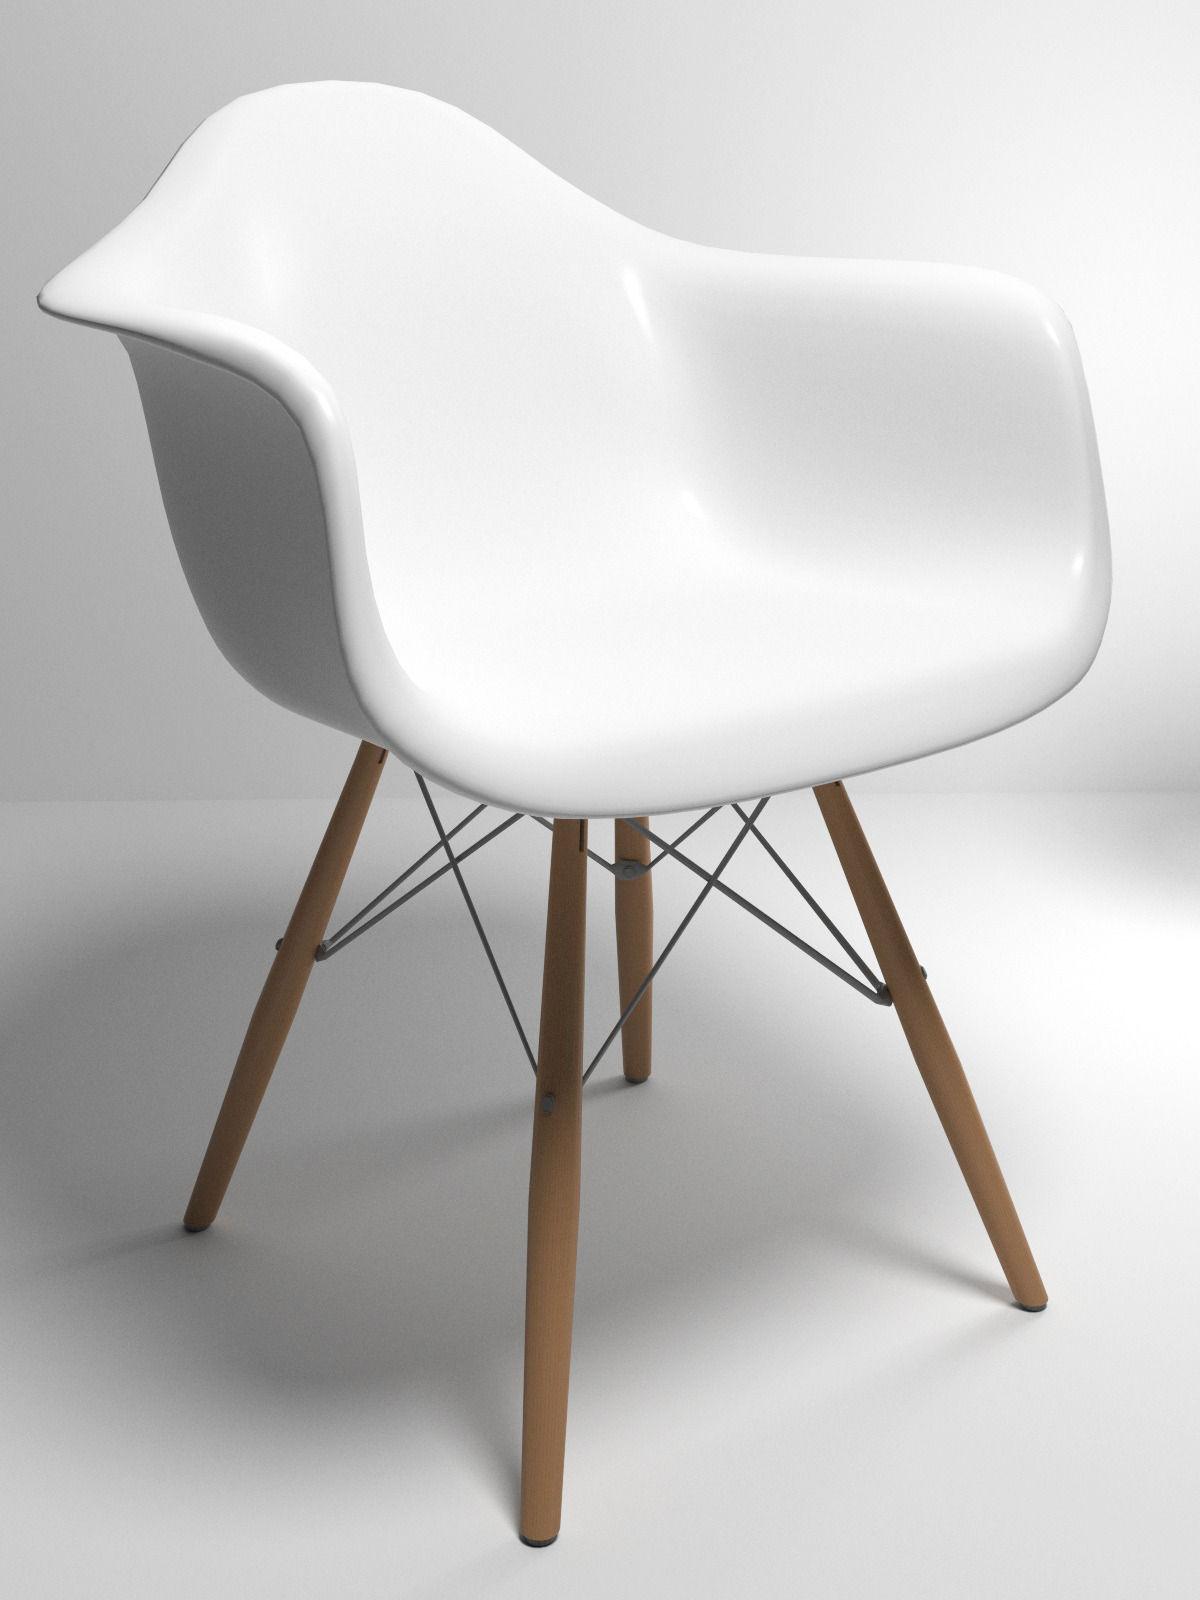 Eames Style Molded Plastic Chair 3d Model Max Obj 3ds Fbx Stl 1 ...